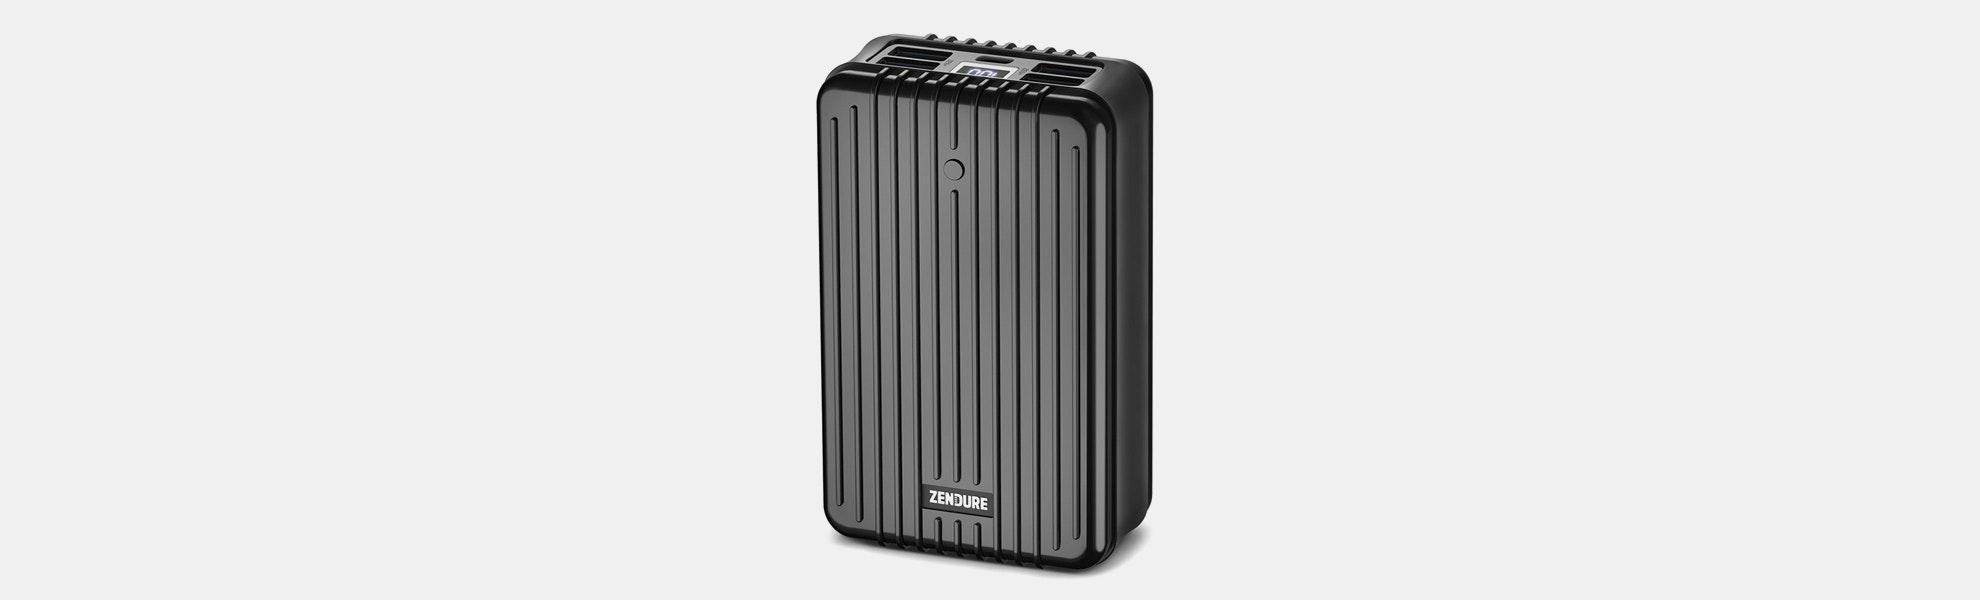 ZENDURE A8PD 26,800mAh USB-C 30W PD Power Banks